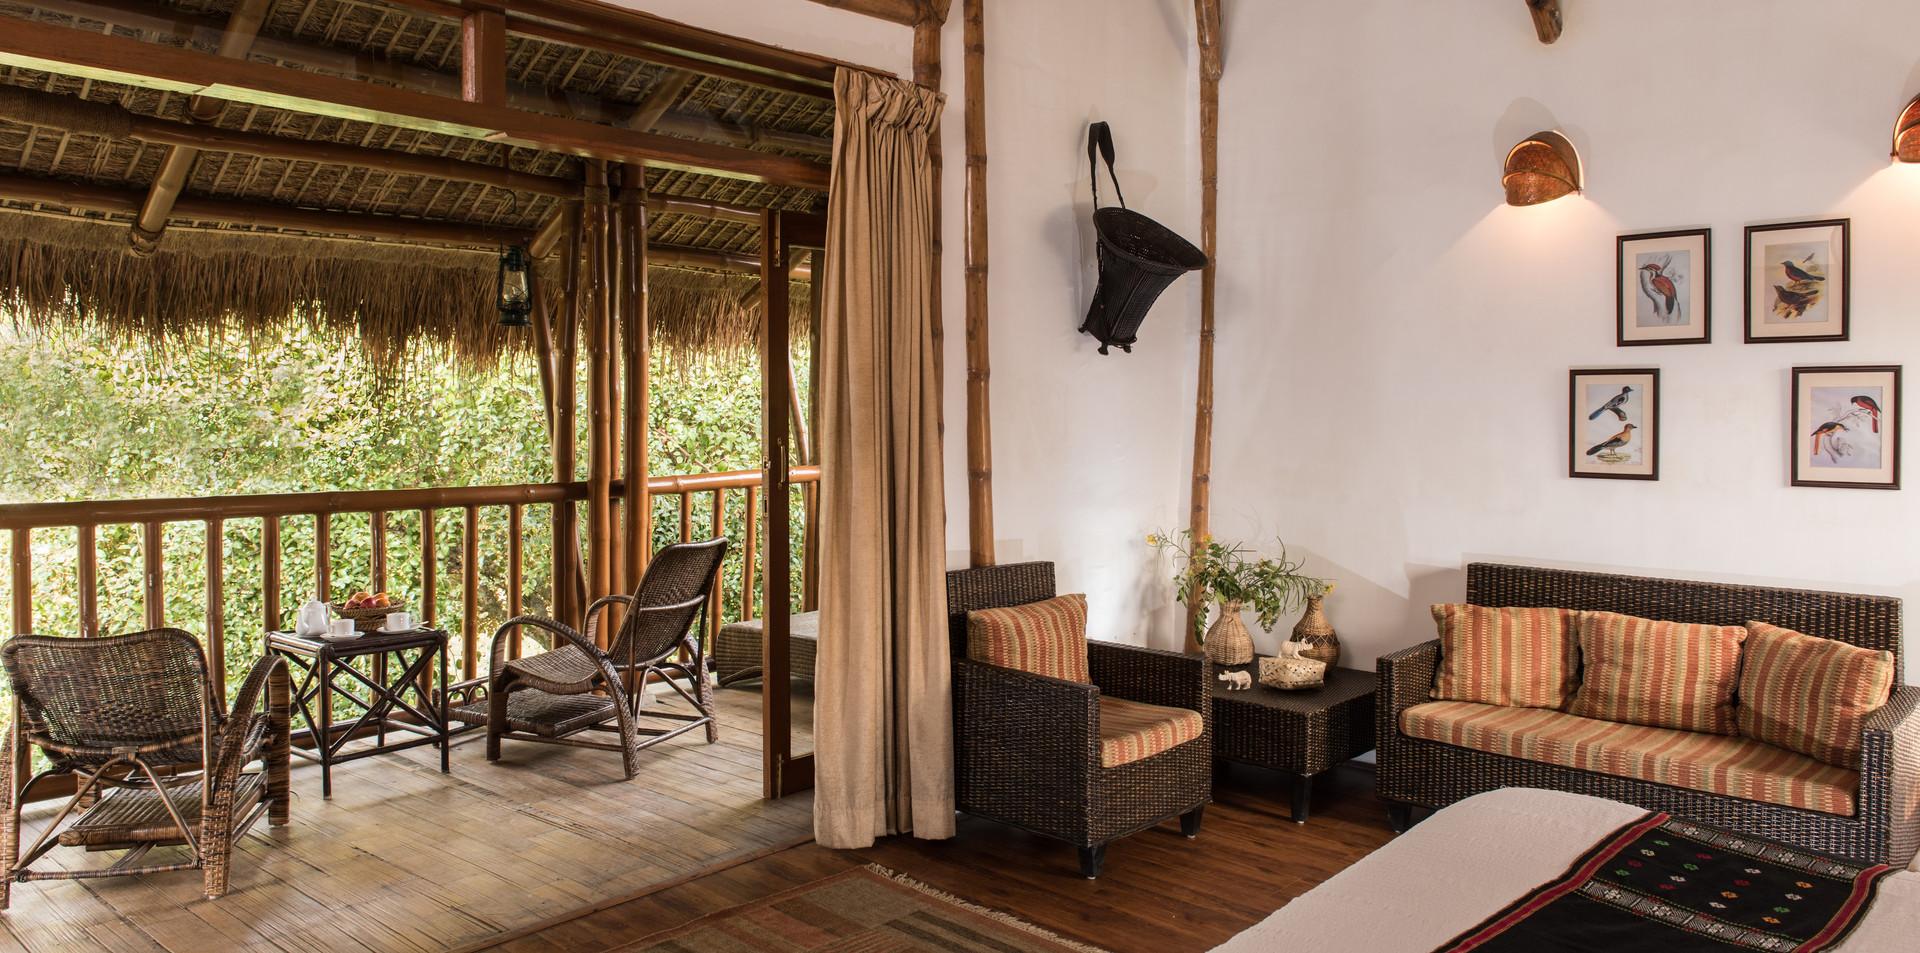 Diphlu cottage's interior.jpg